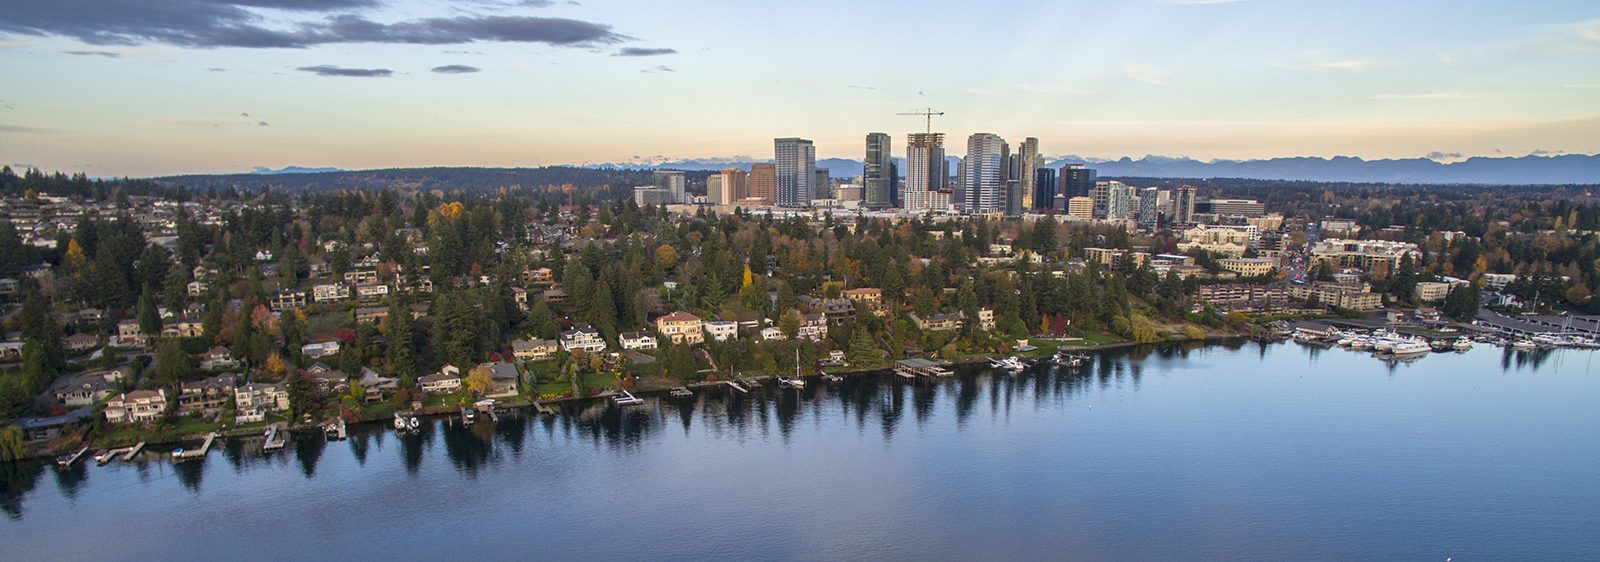 Bellevue, Washington skyline from Lake Washington